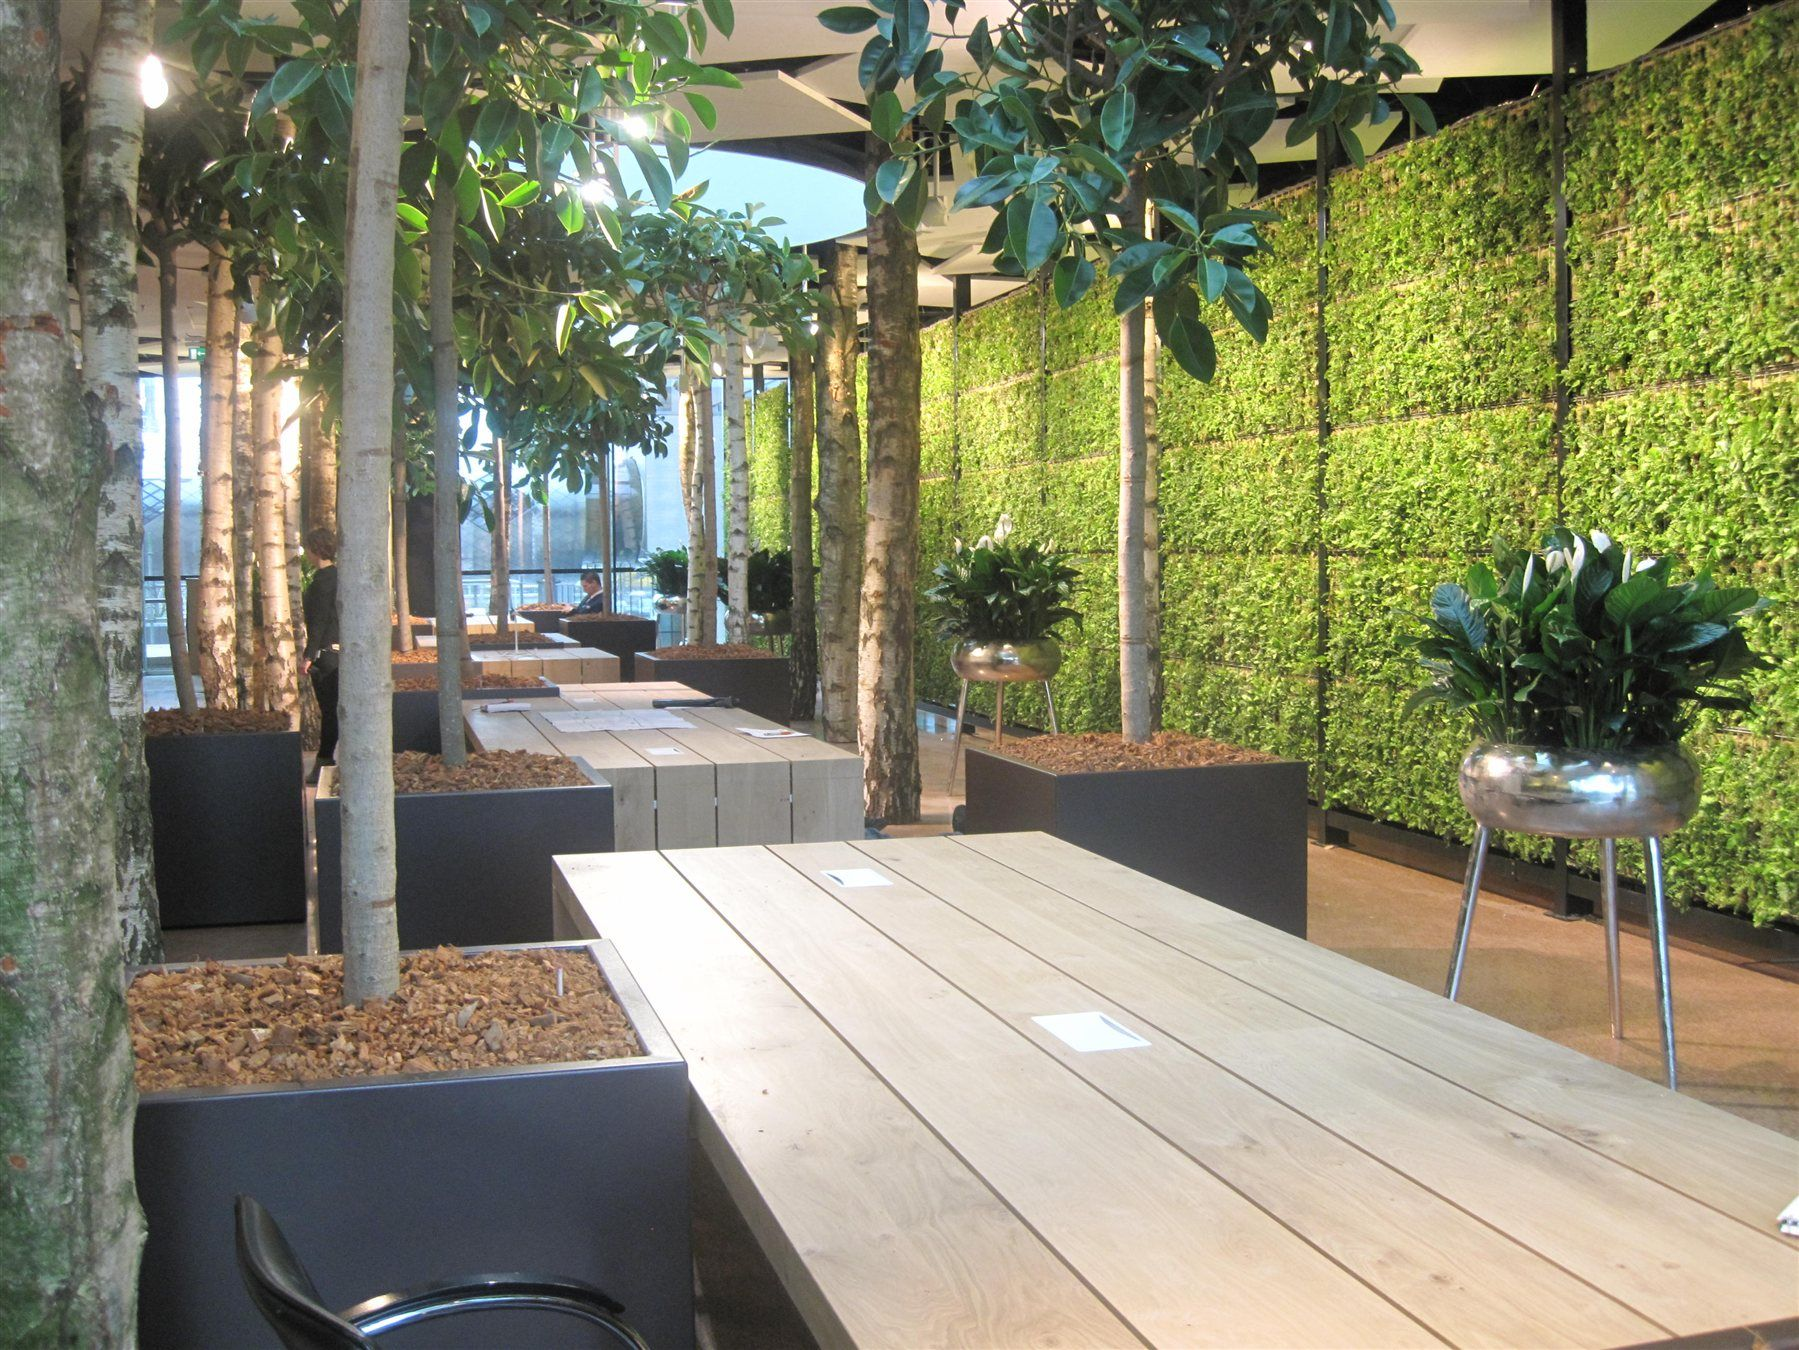 rabobank beehive office in utretch nl by sanders. Black Bedroom Furniture Sets. Home Design Ideas